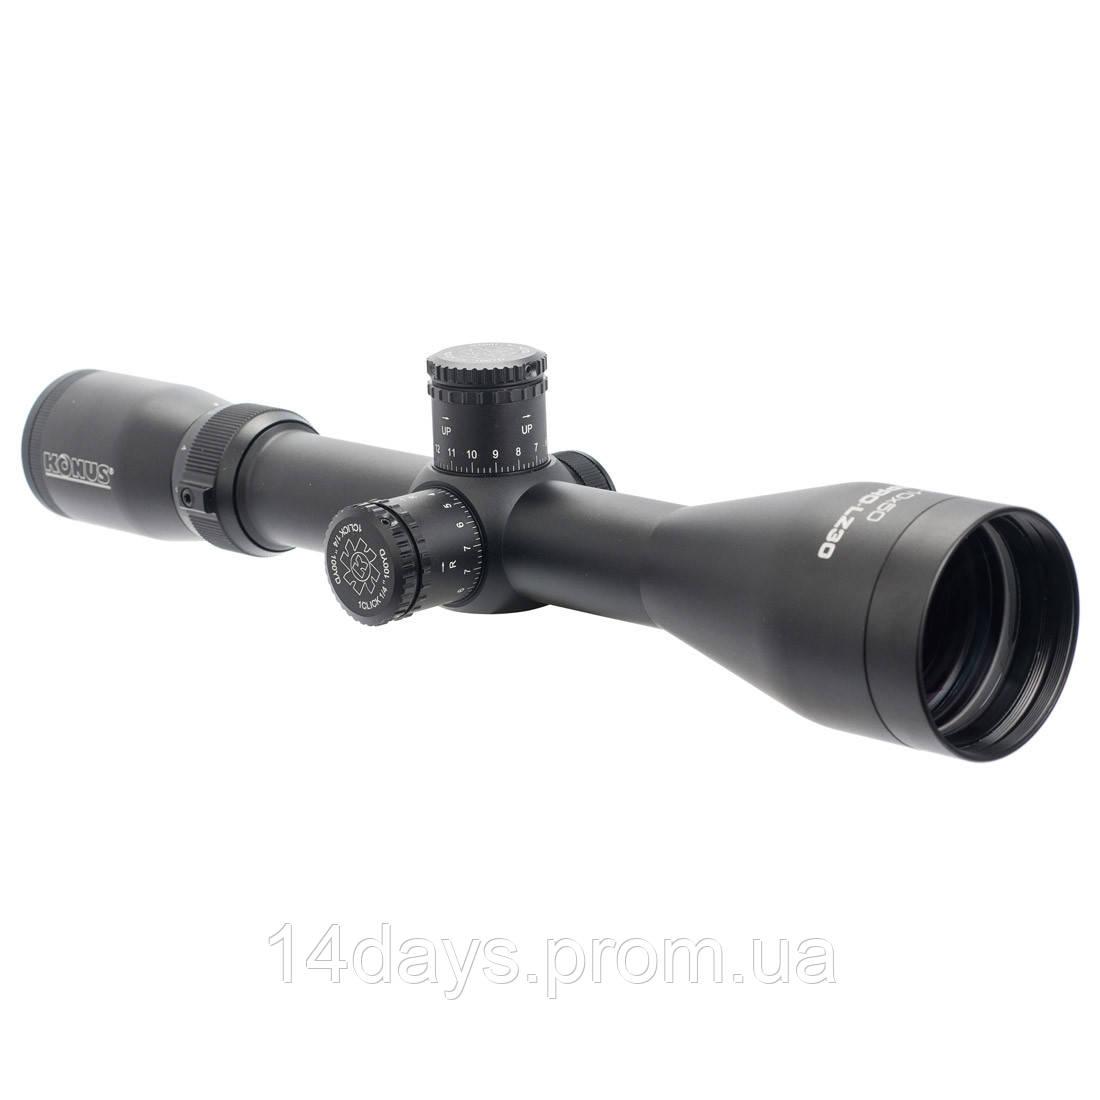 Оптический прицел Konus KonusPro LZ-30 2.5-10x50 EWF 30/30 IR